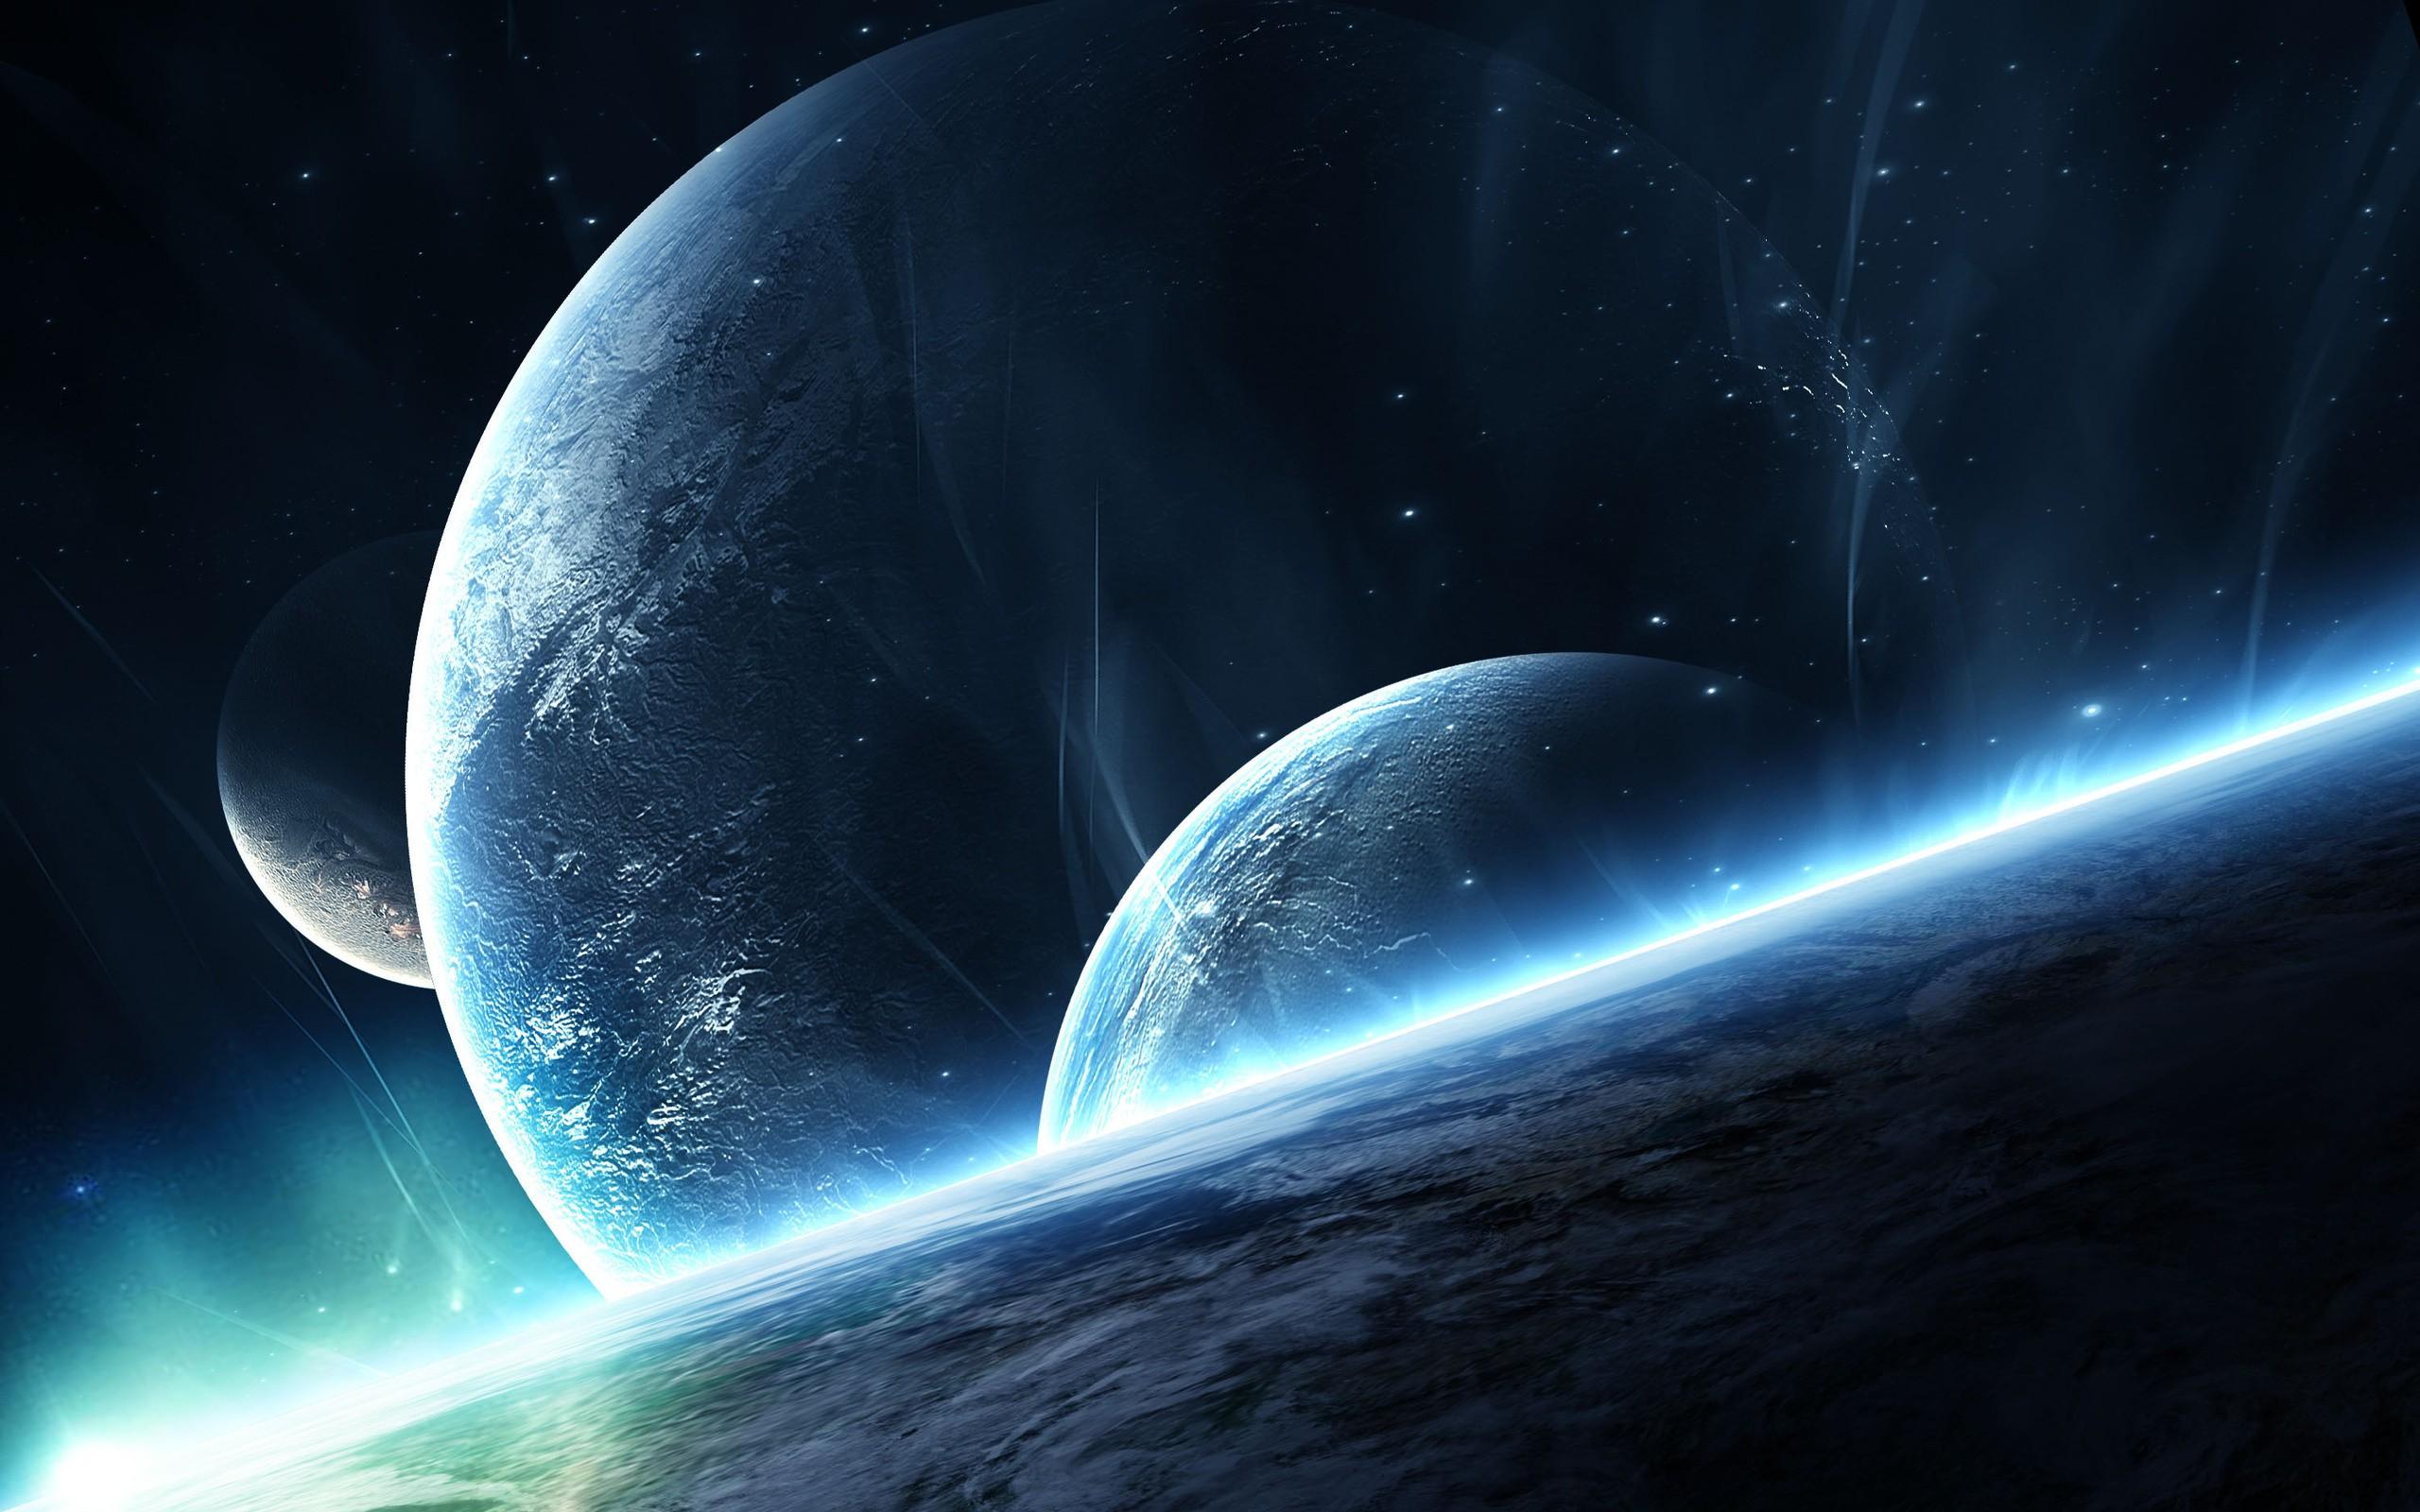 Desktop Backgrounds Space Wallpaper 4k